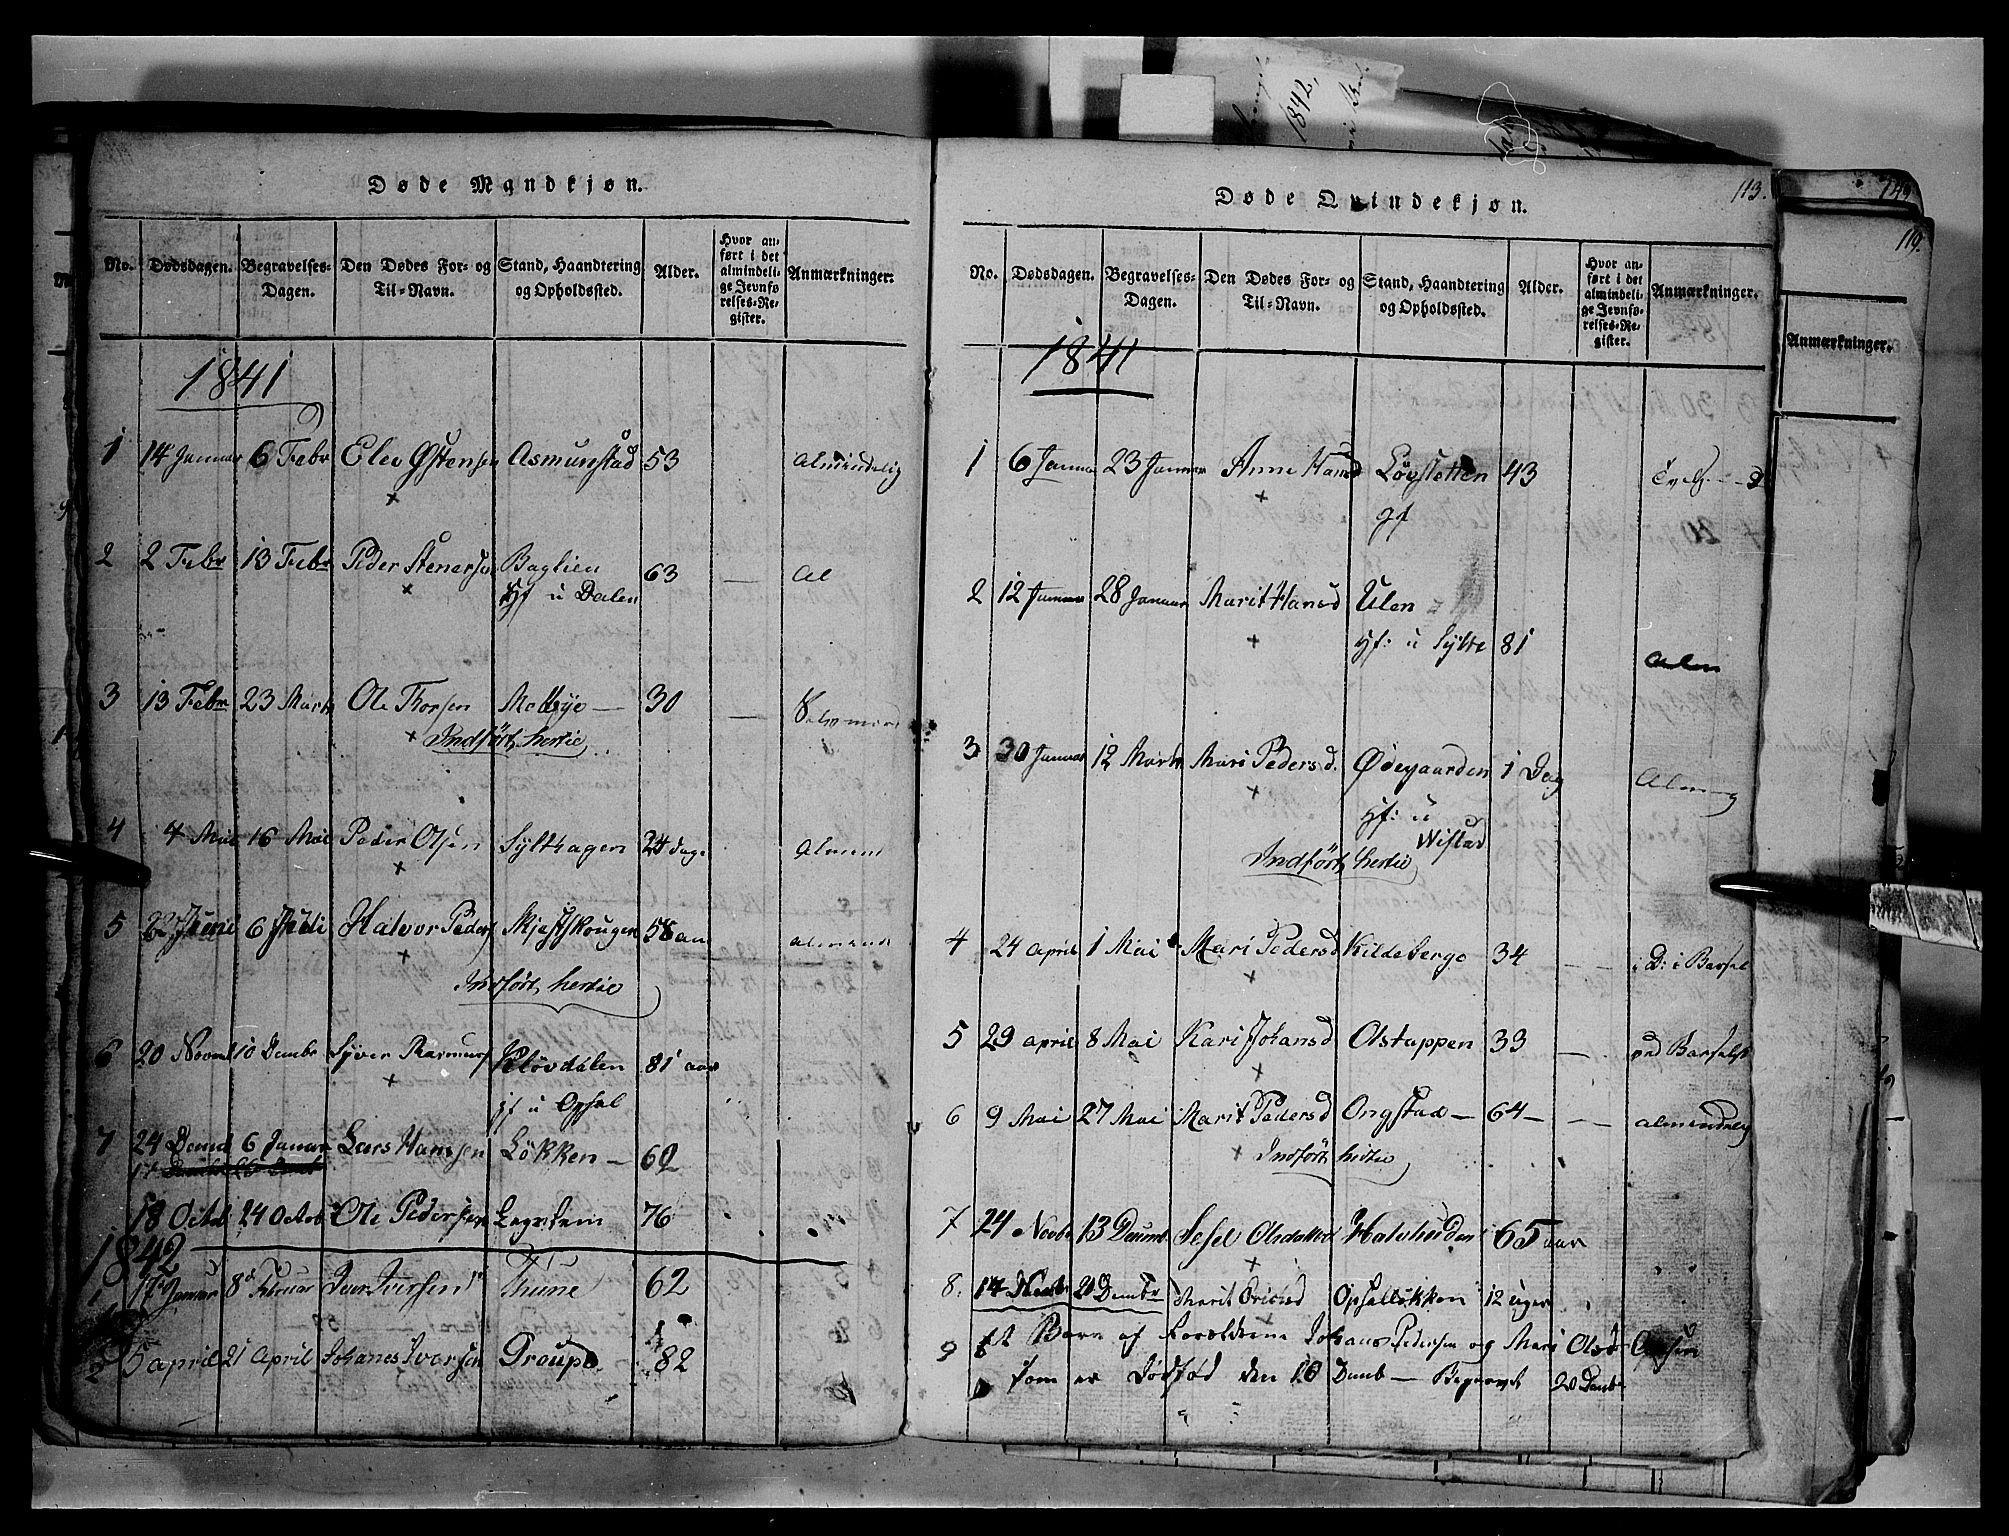 SAH, Fron prestekontor, H/Ha/Hab/L0003: Klokkerbok nr. 3, 1816-1850, s. 113